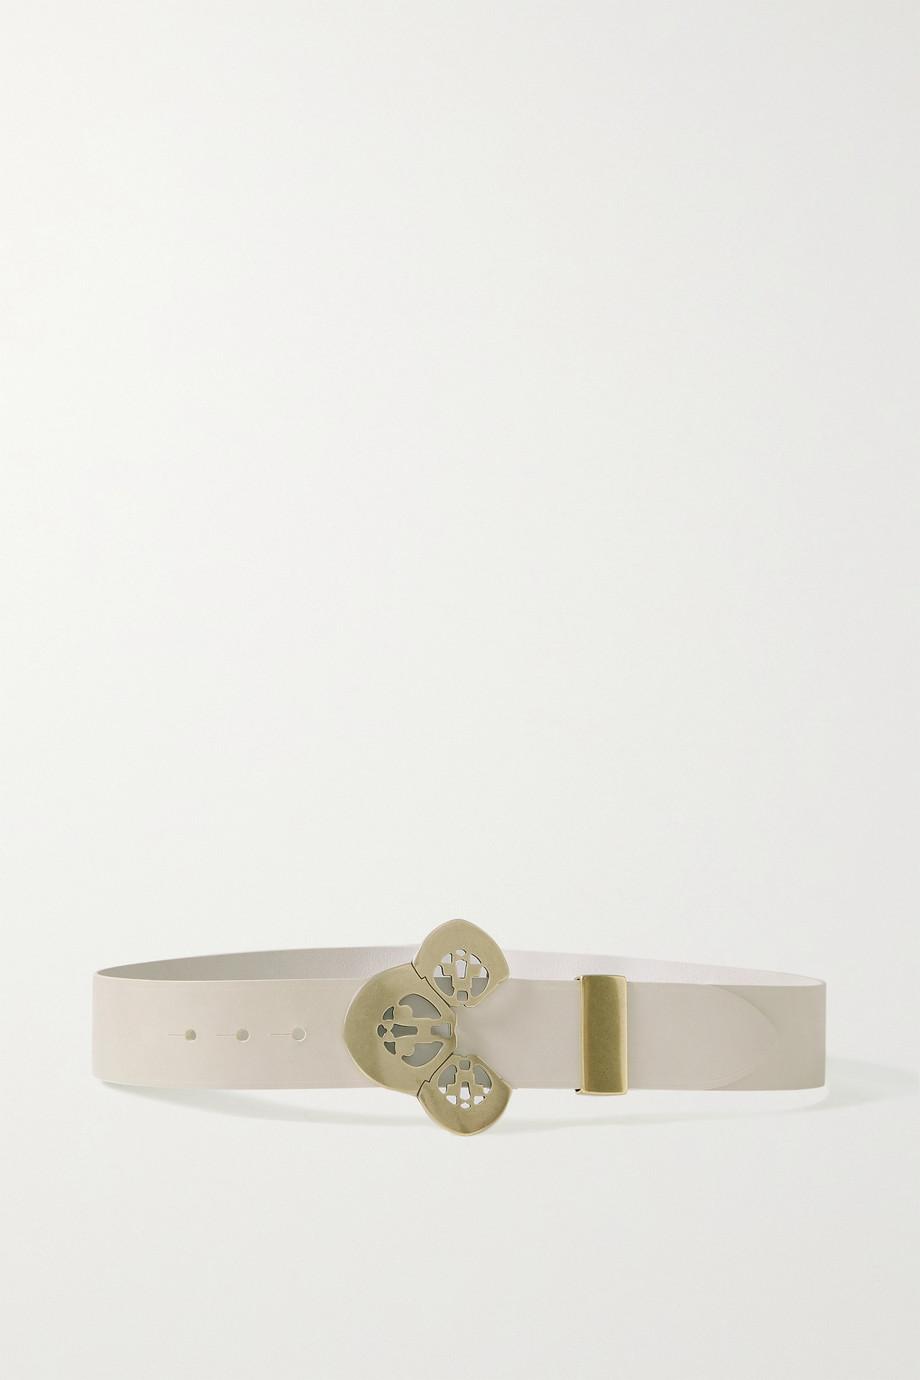 Isabel Marant Adaria leather waist belt